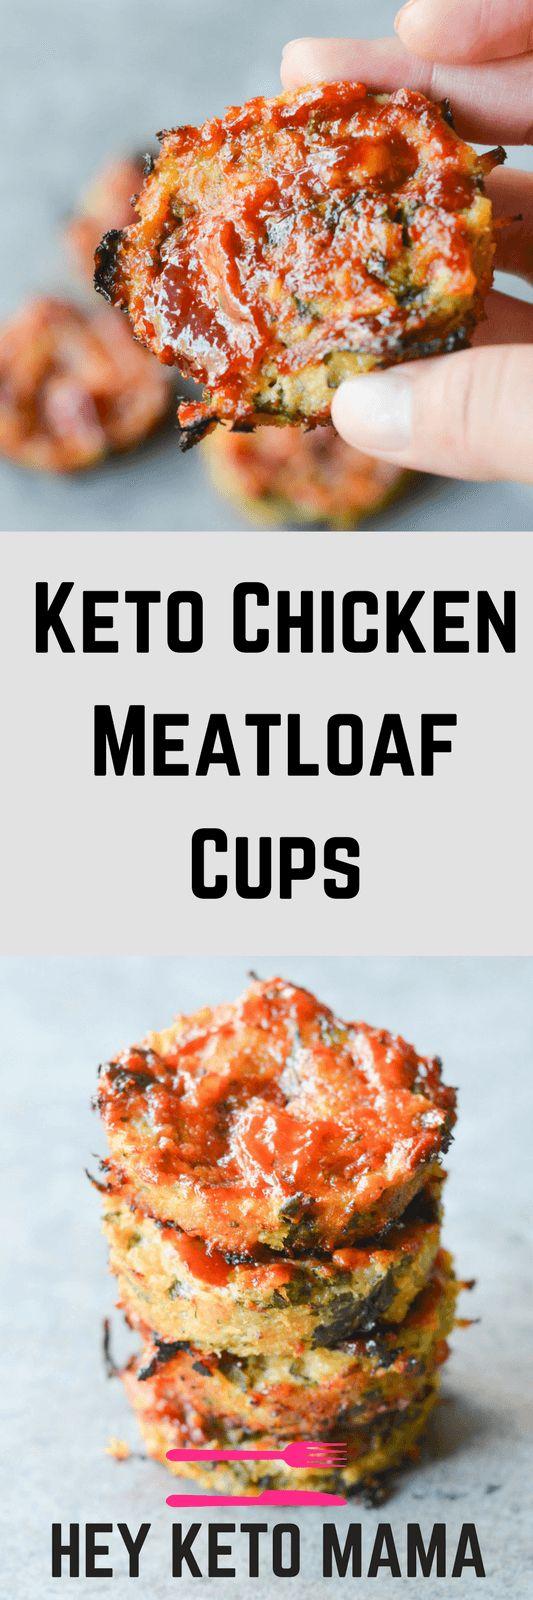 Easy Keto Chicken Meatloaf Cups Recipe